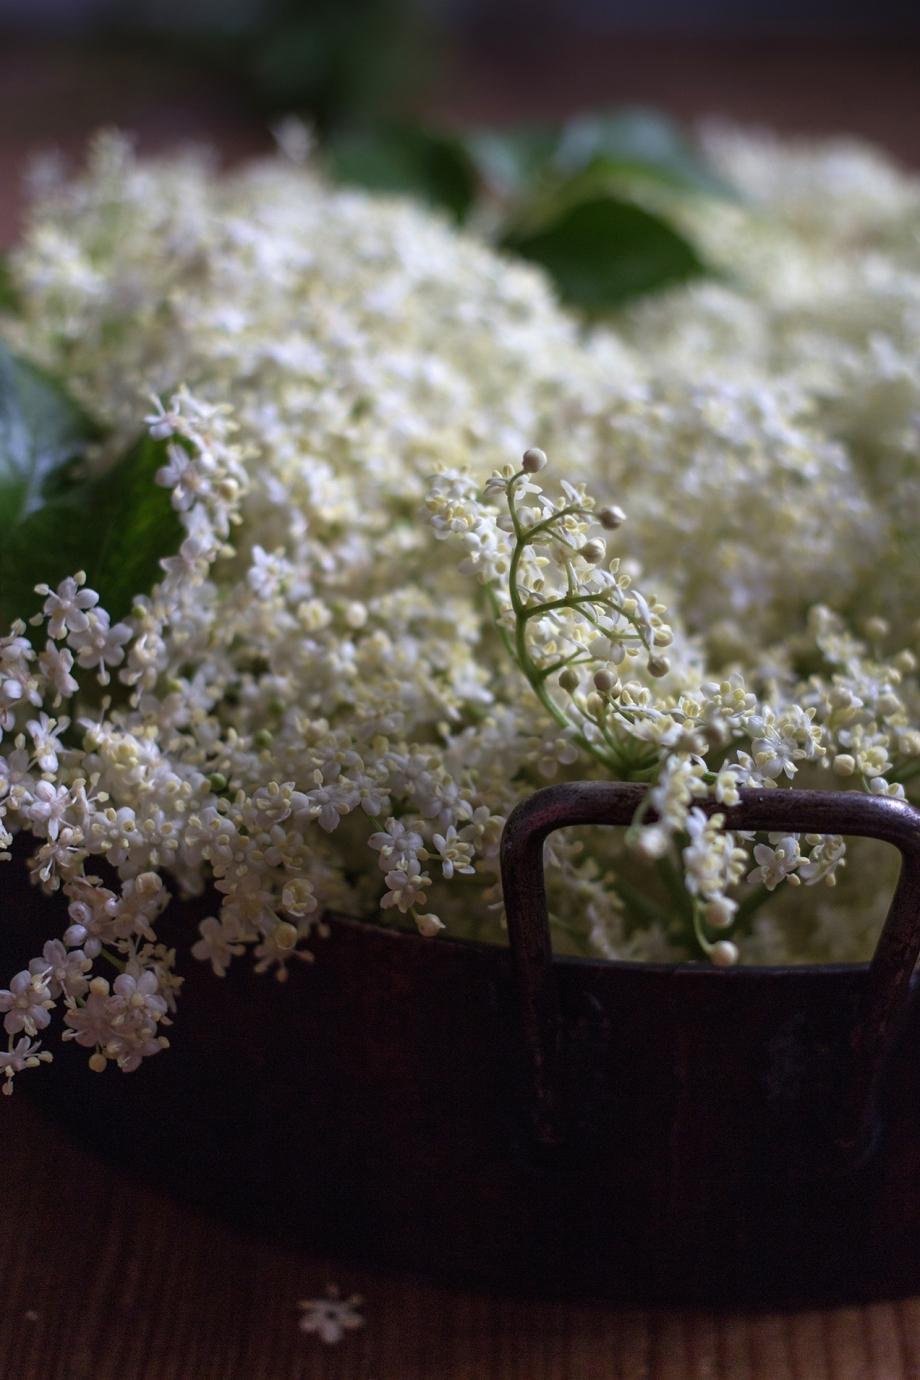 Elderflower | chilitonka